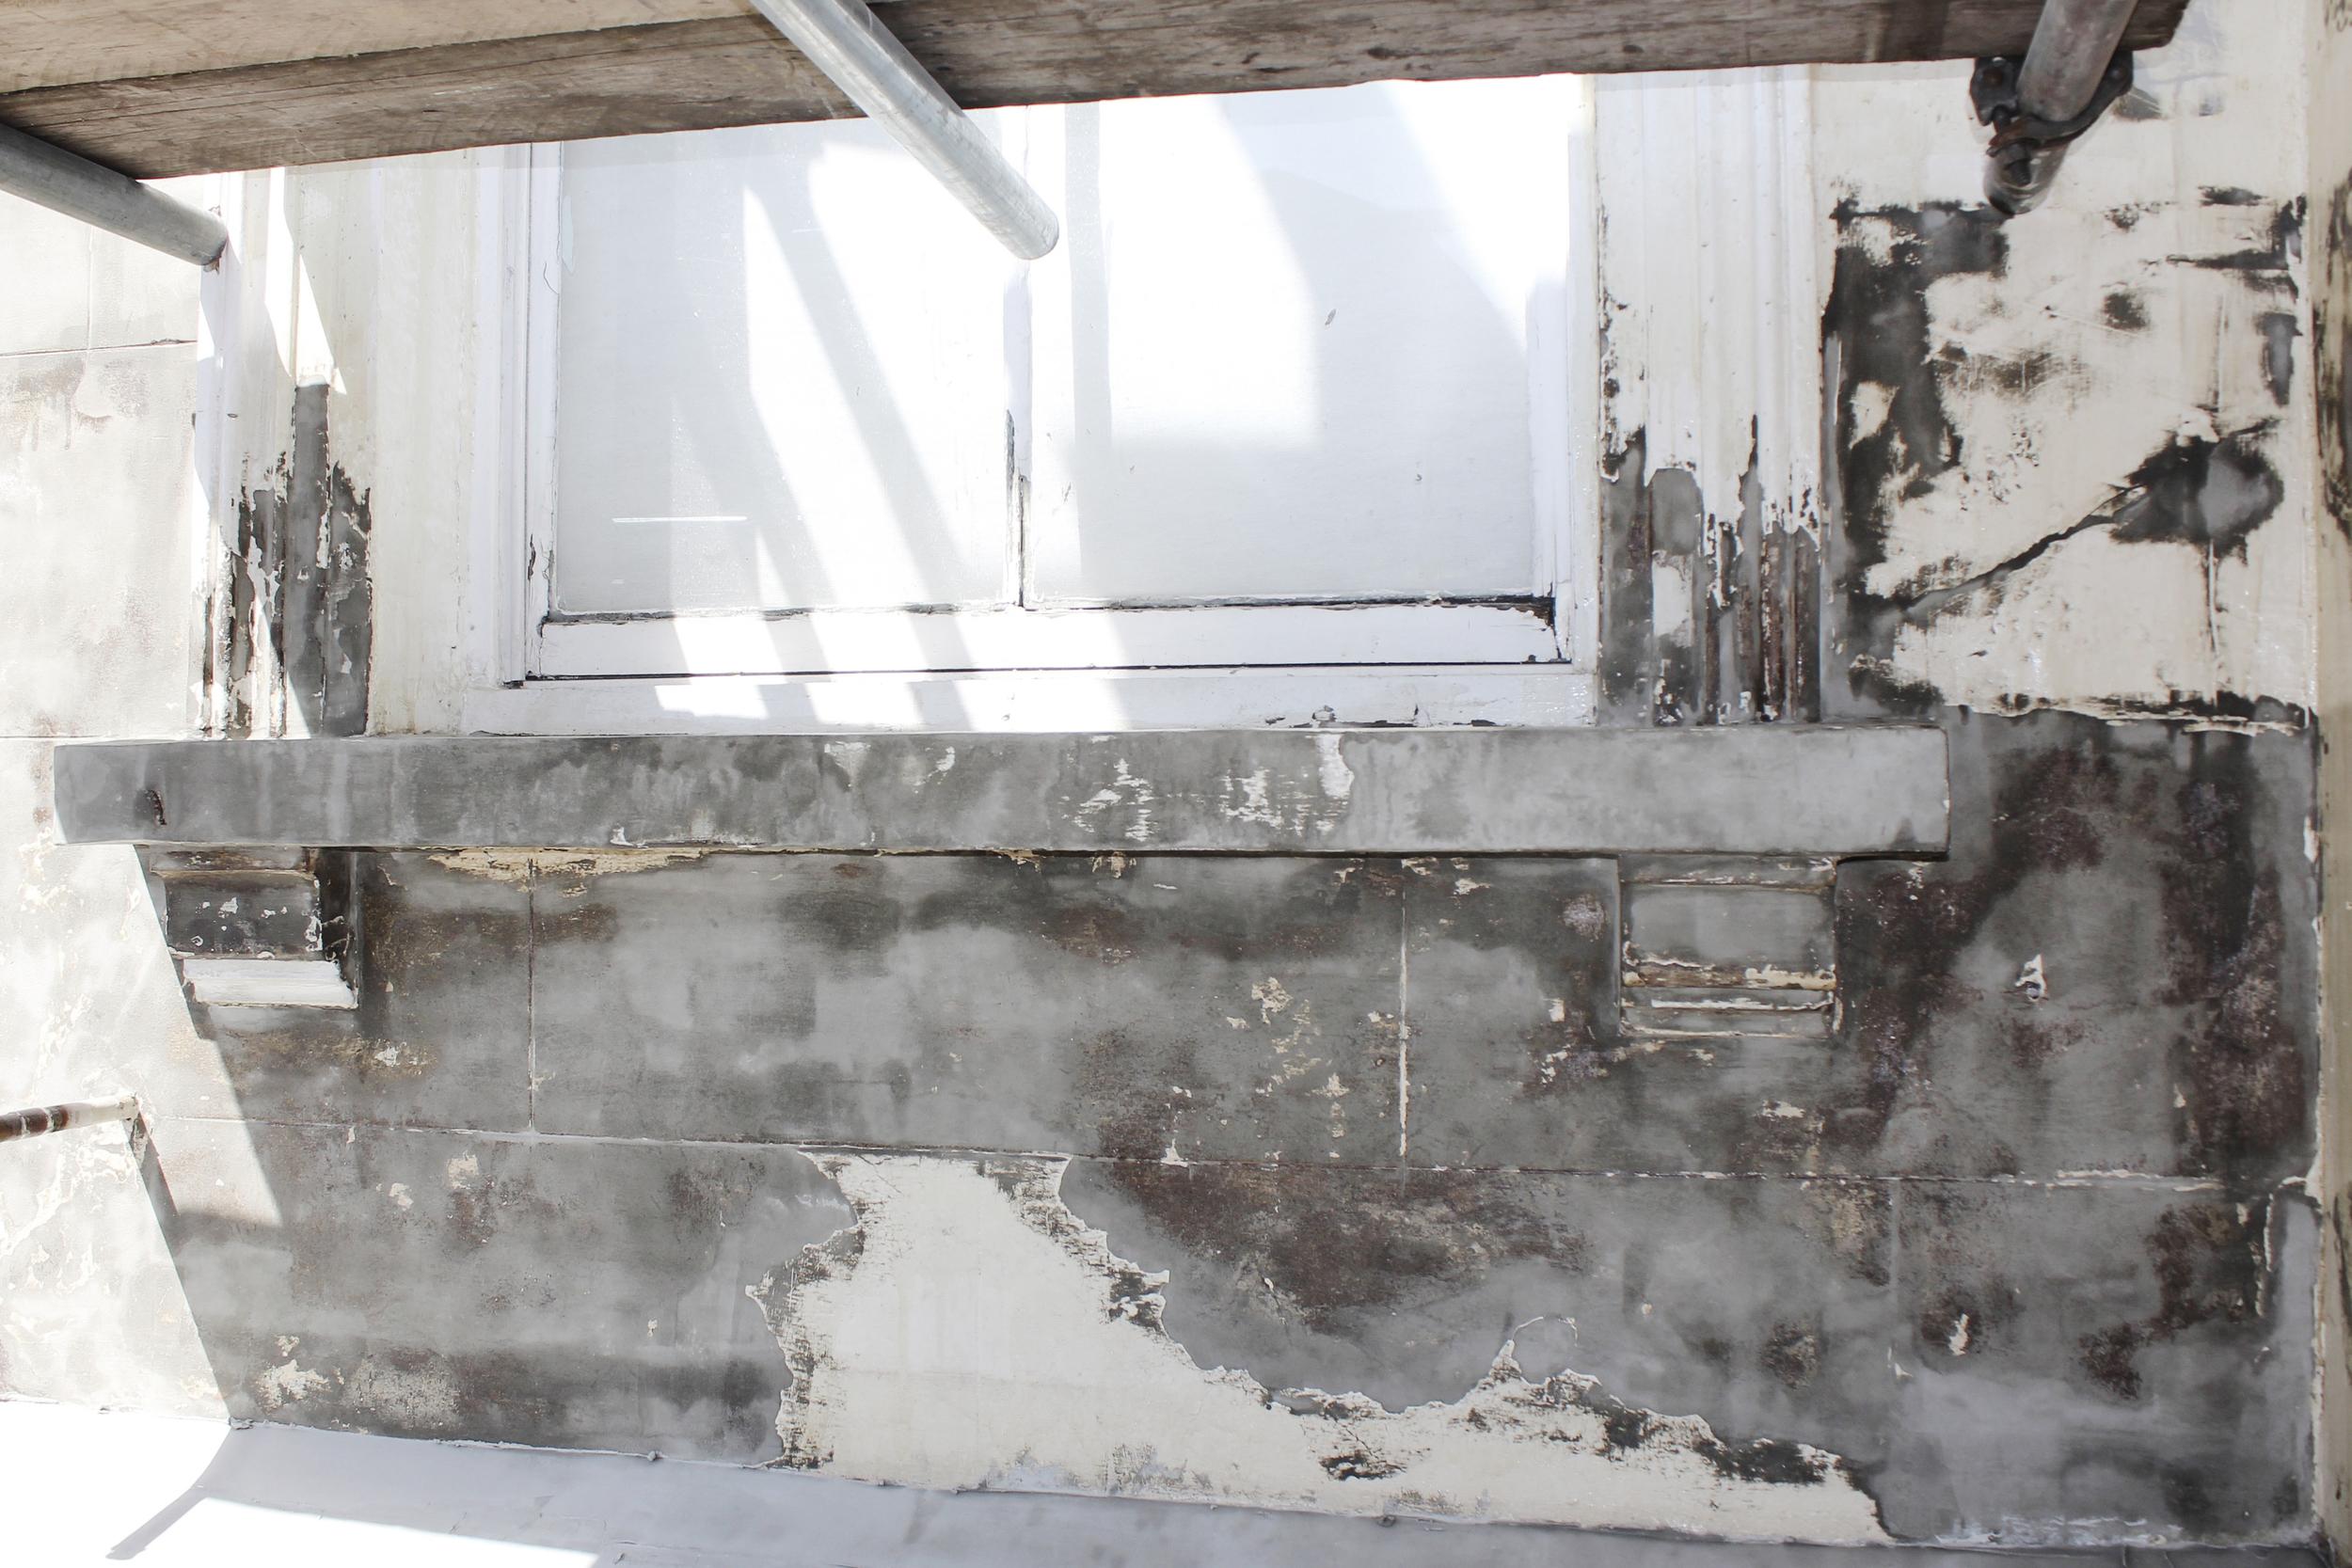 #NHRenovations #Painter #Decorator #London #Kentishtown #Kentish #Listedbuilding #Windows #Masonry #Limeplaster #Prepwork #Keim #Keimminerals #Keystones #Exterior #Building #Toupret